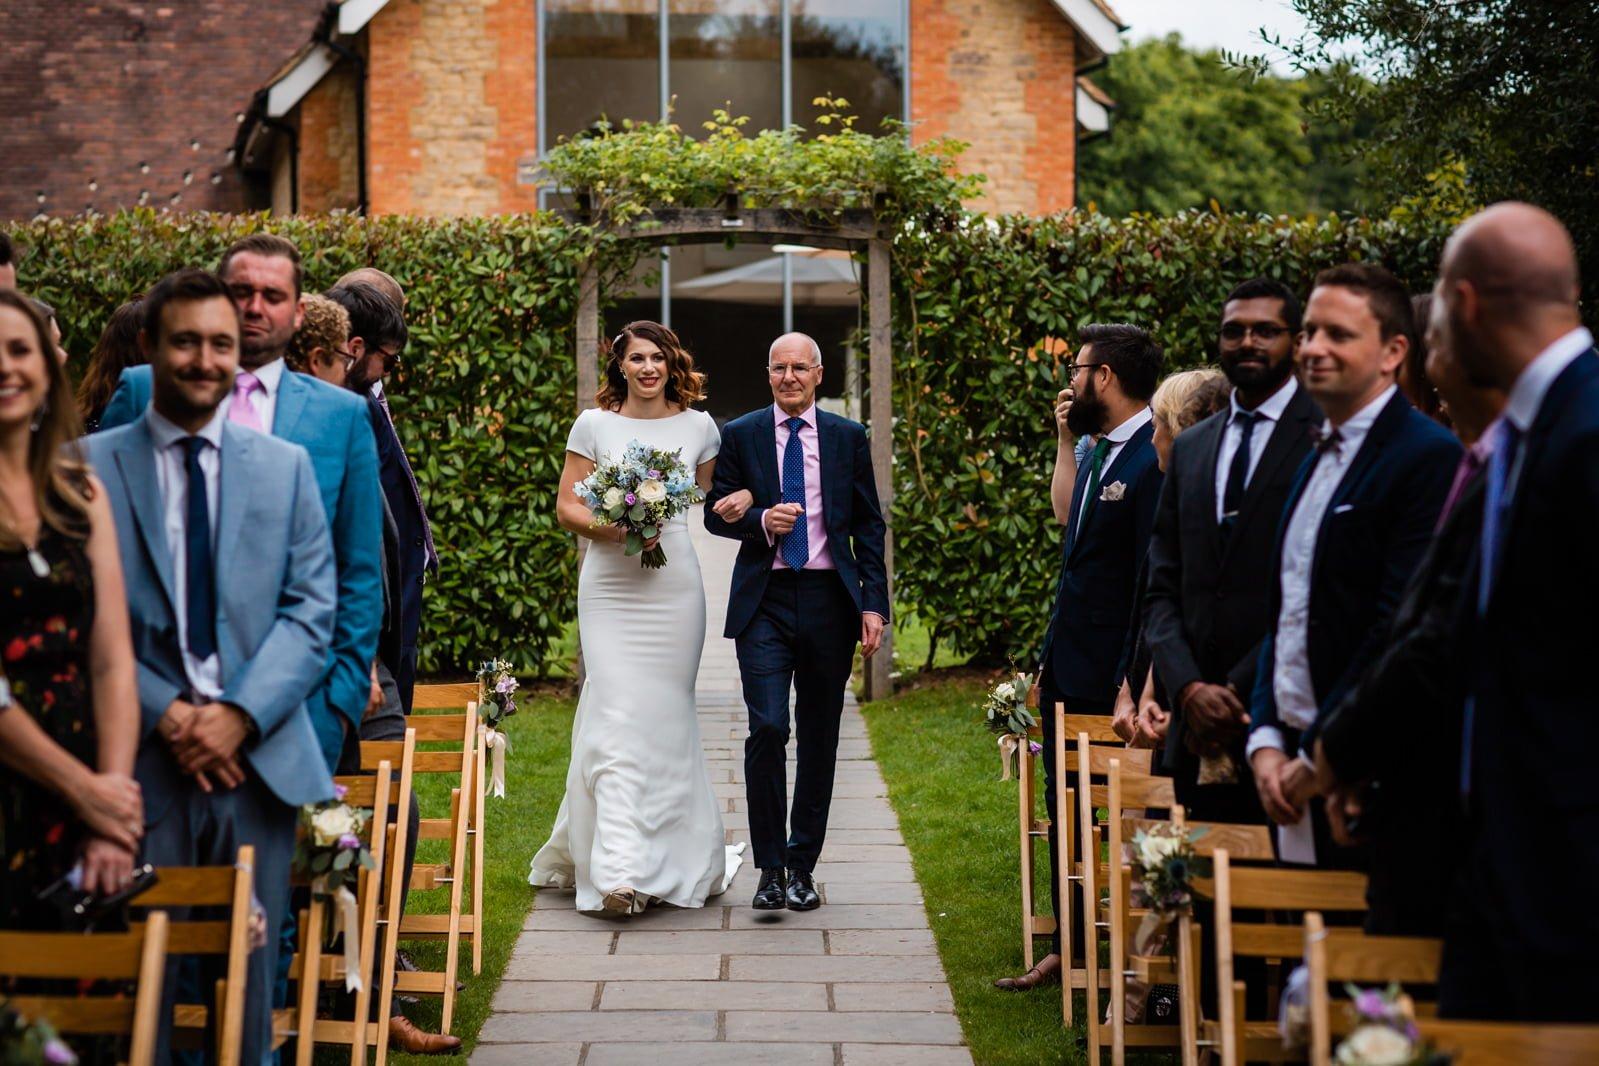 Millbridge Court Wedding - stunning summer wedding - wedding photography 49